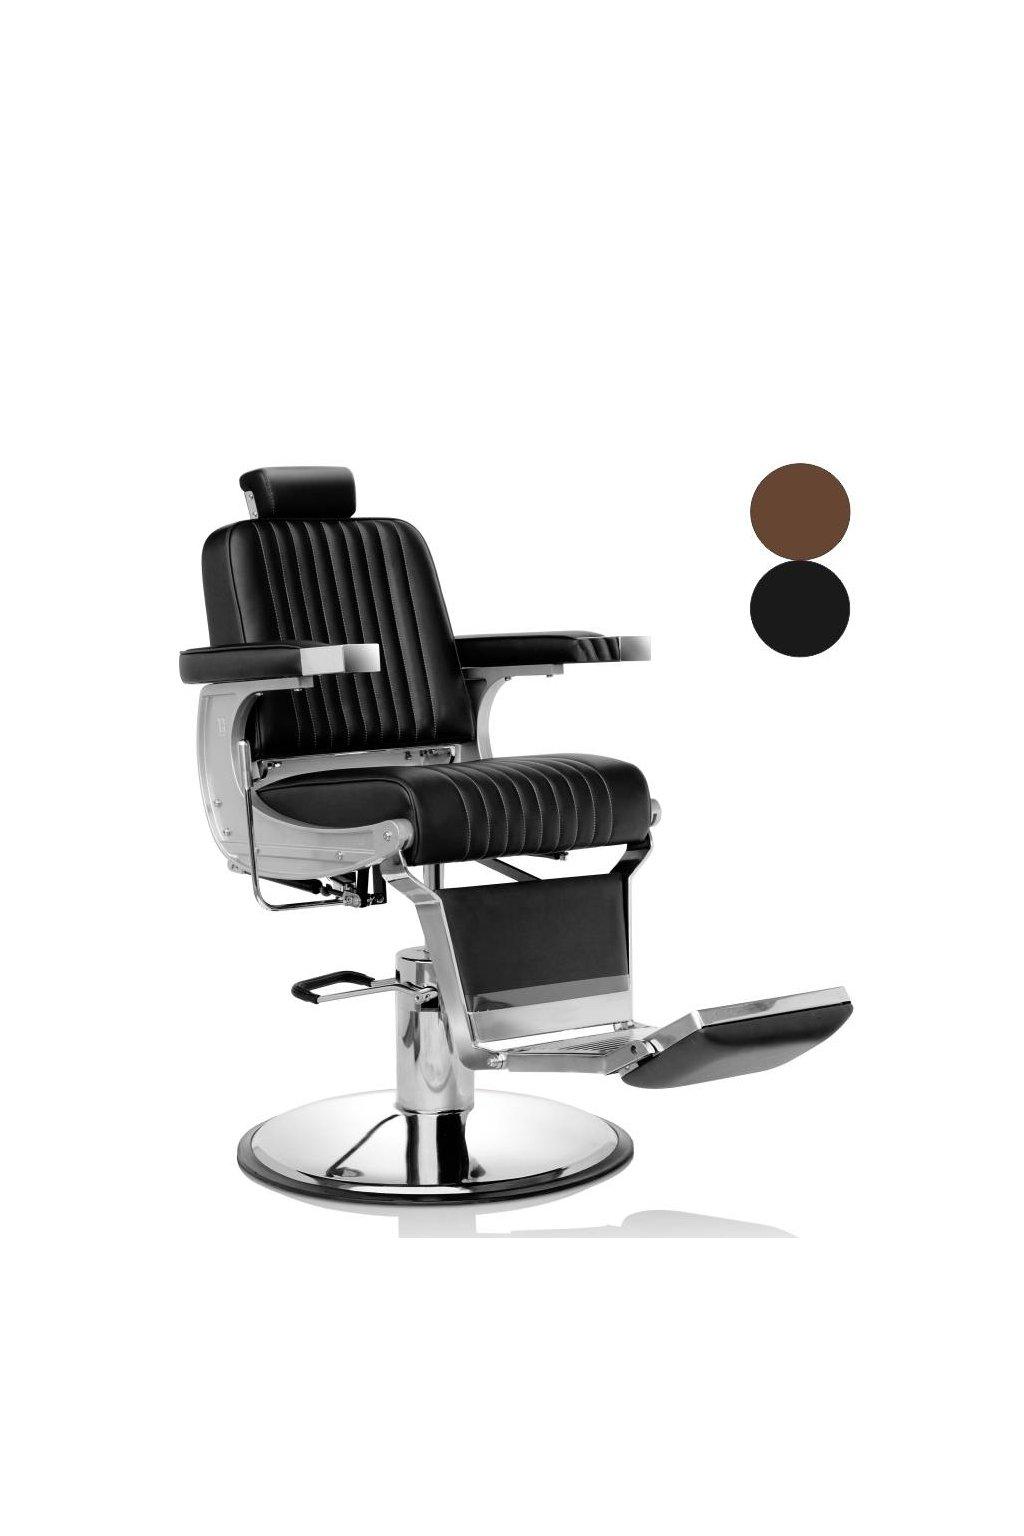 Křeslo pánské HAIR TRIUMPH hydraulika s brzdou (Barva Černá)